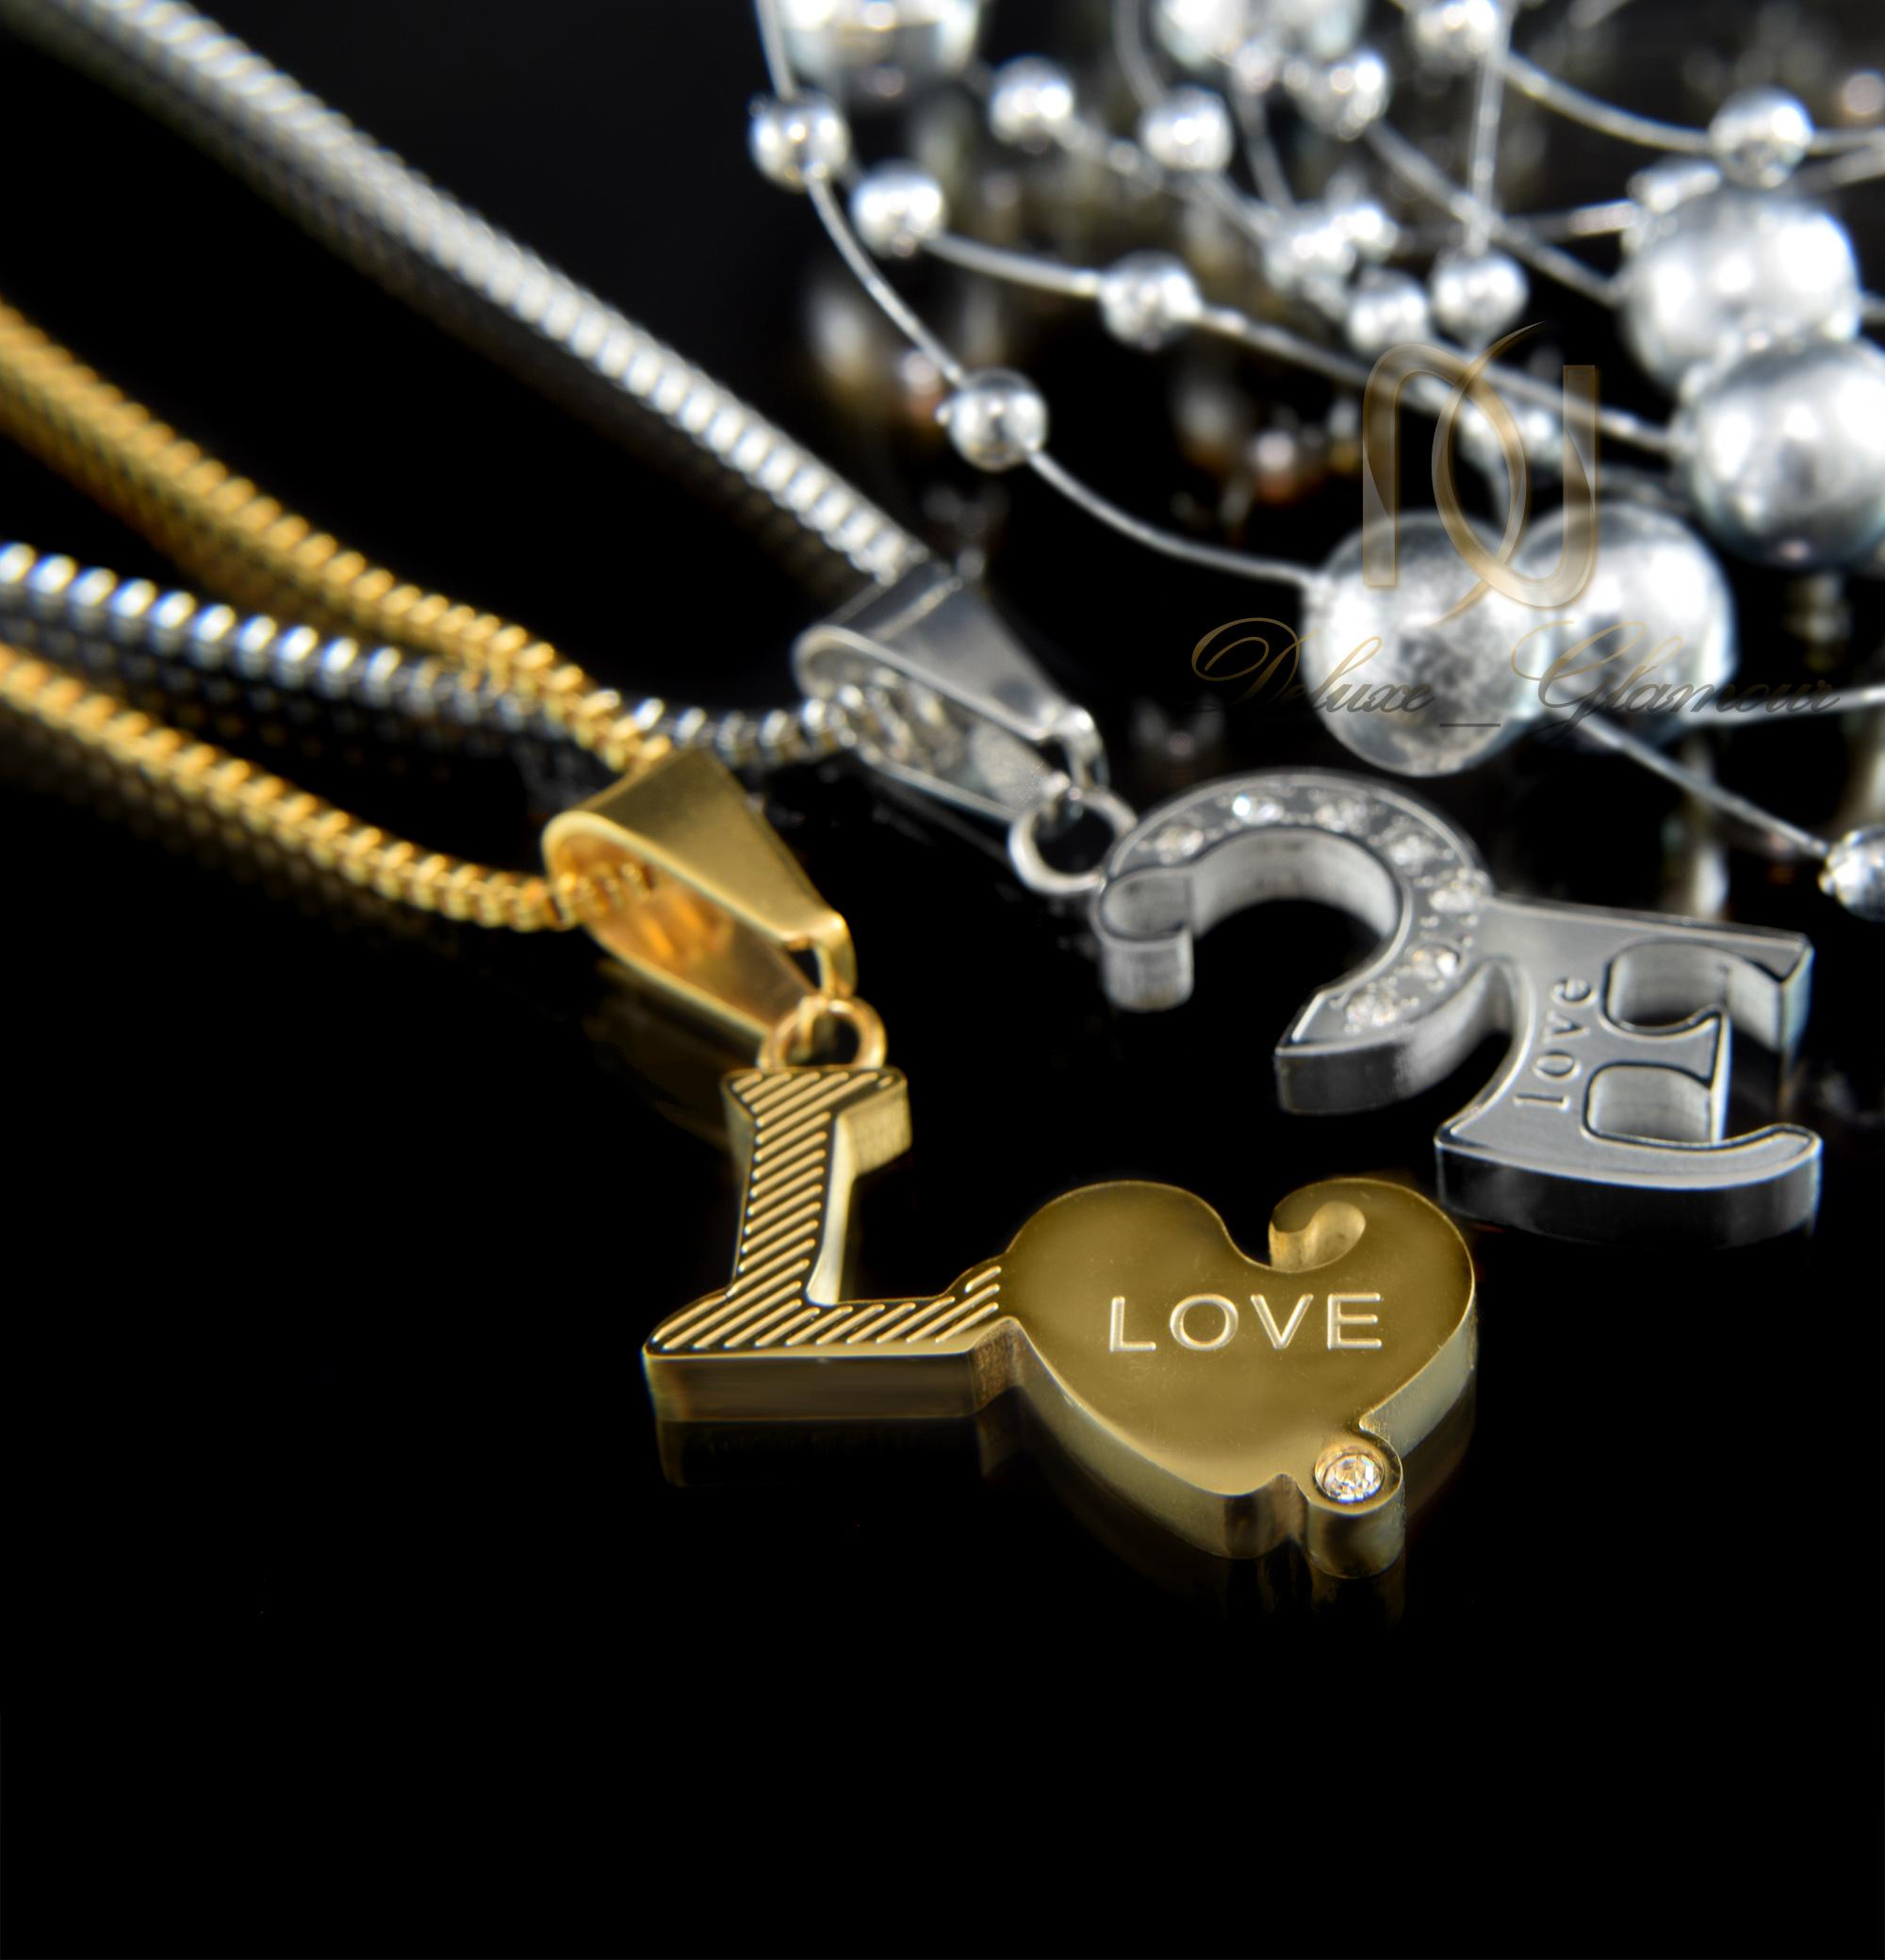 گردنبند ست عاشقانه طرح لاو و قلب mf-n117 (3)